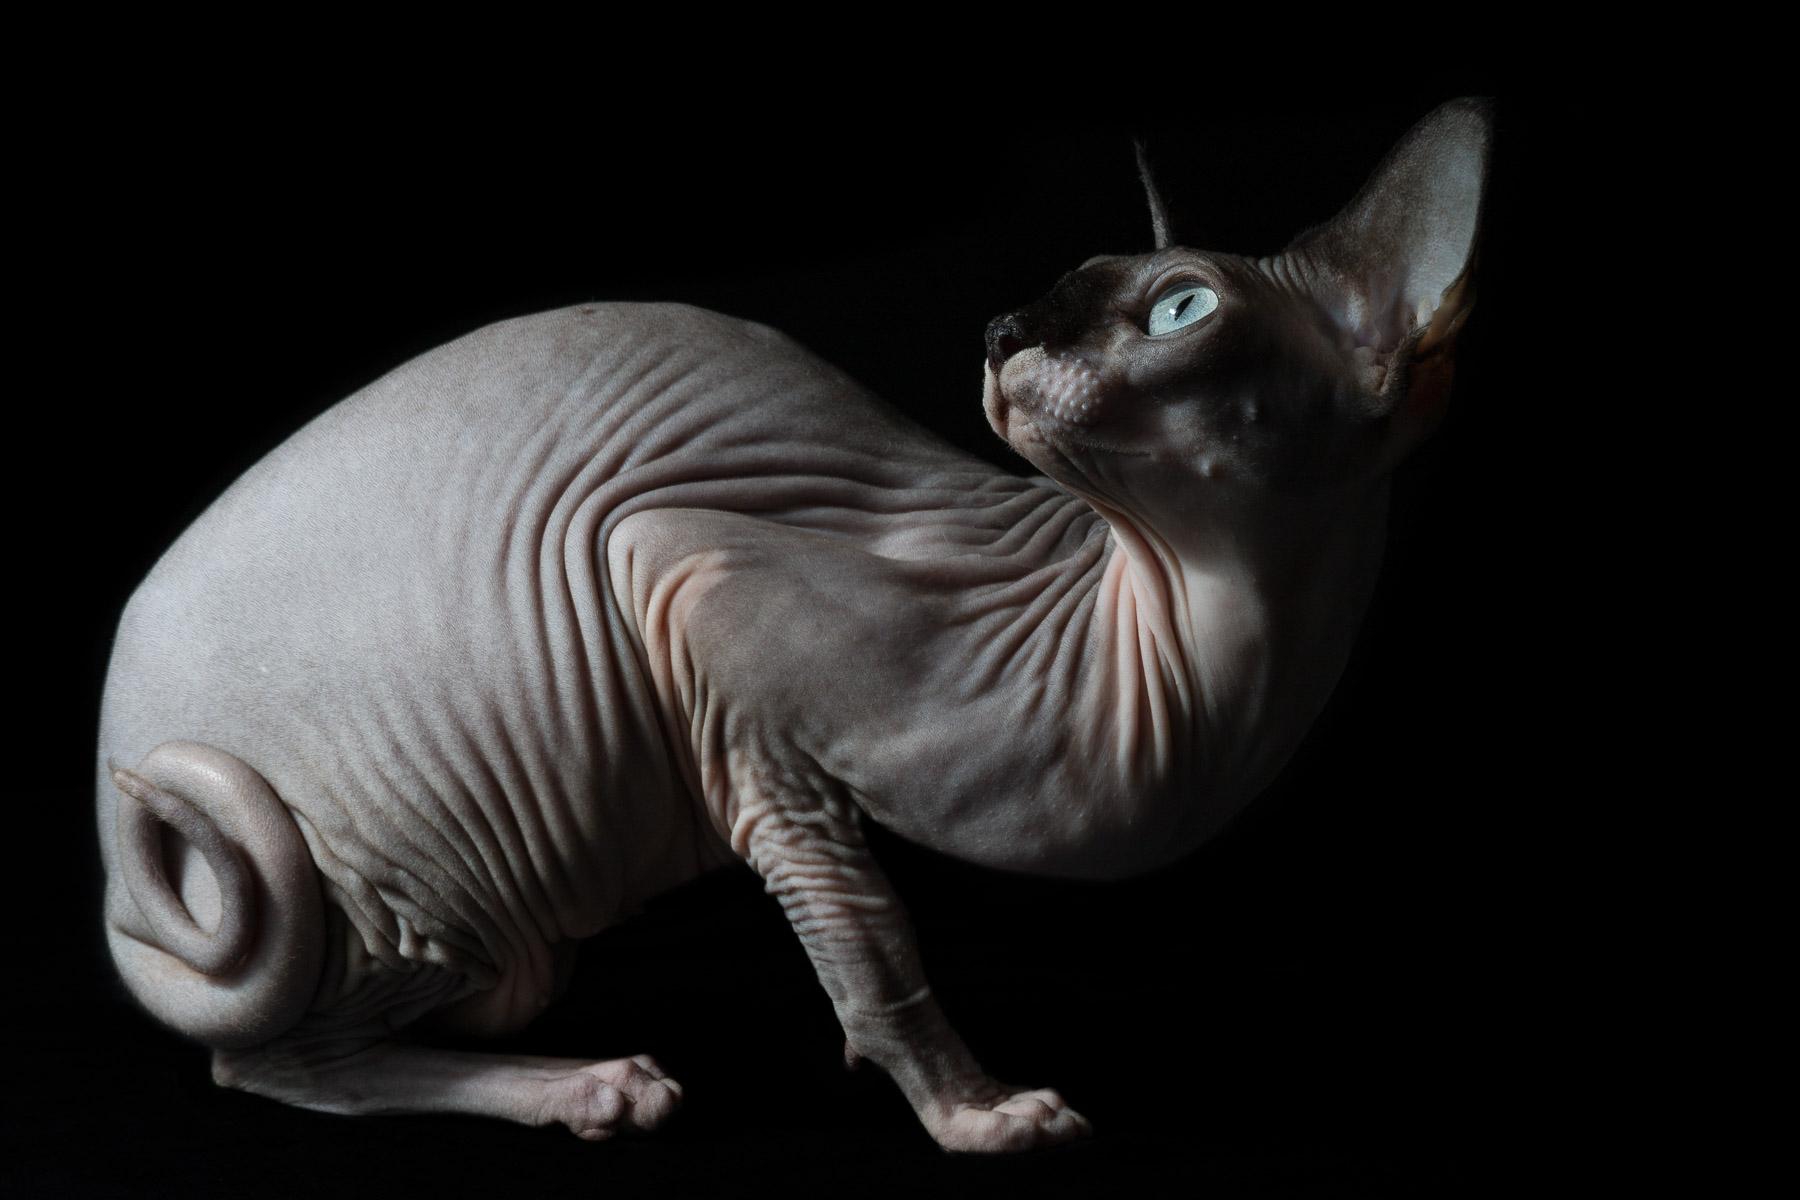 9Sphynx-cat-hairless-cat-photographer-pets-alicia-rius.jpg